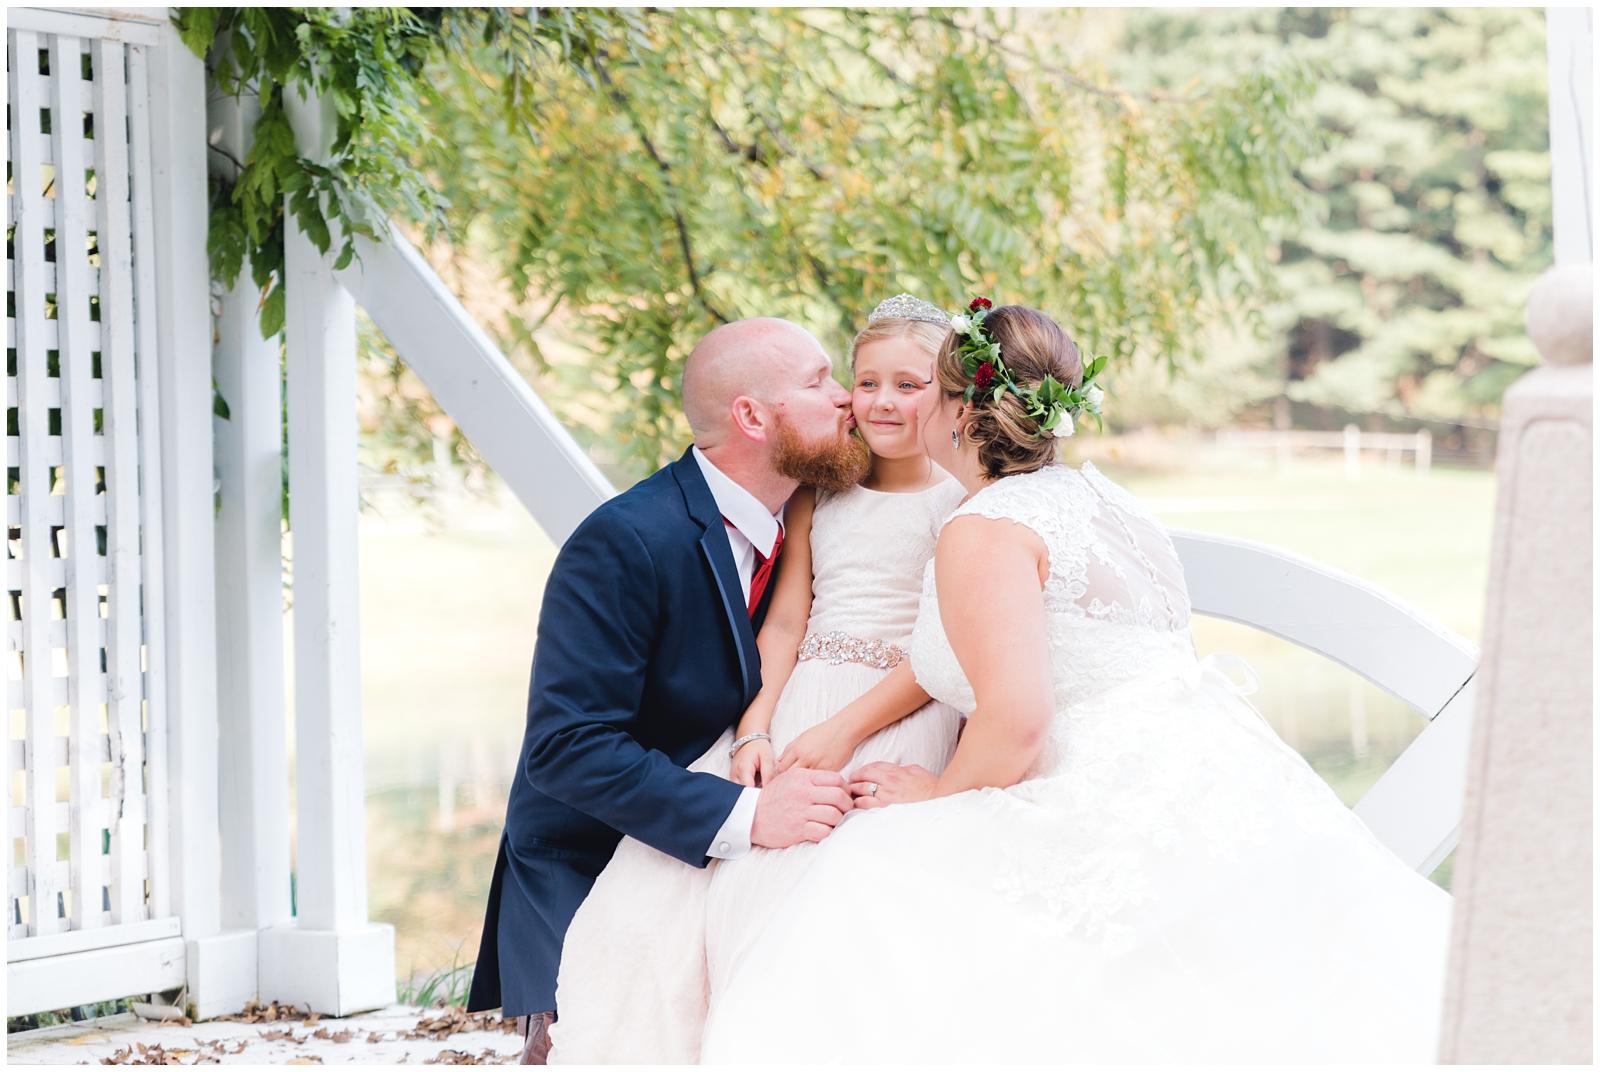 lancaster-ohio-fall-wedding-lra-photo_0009.jpg